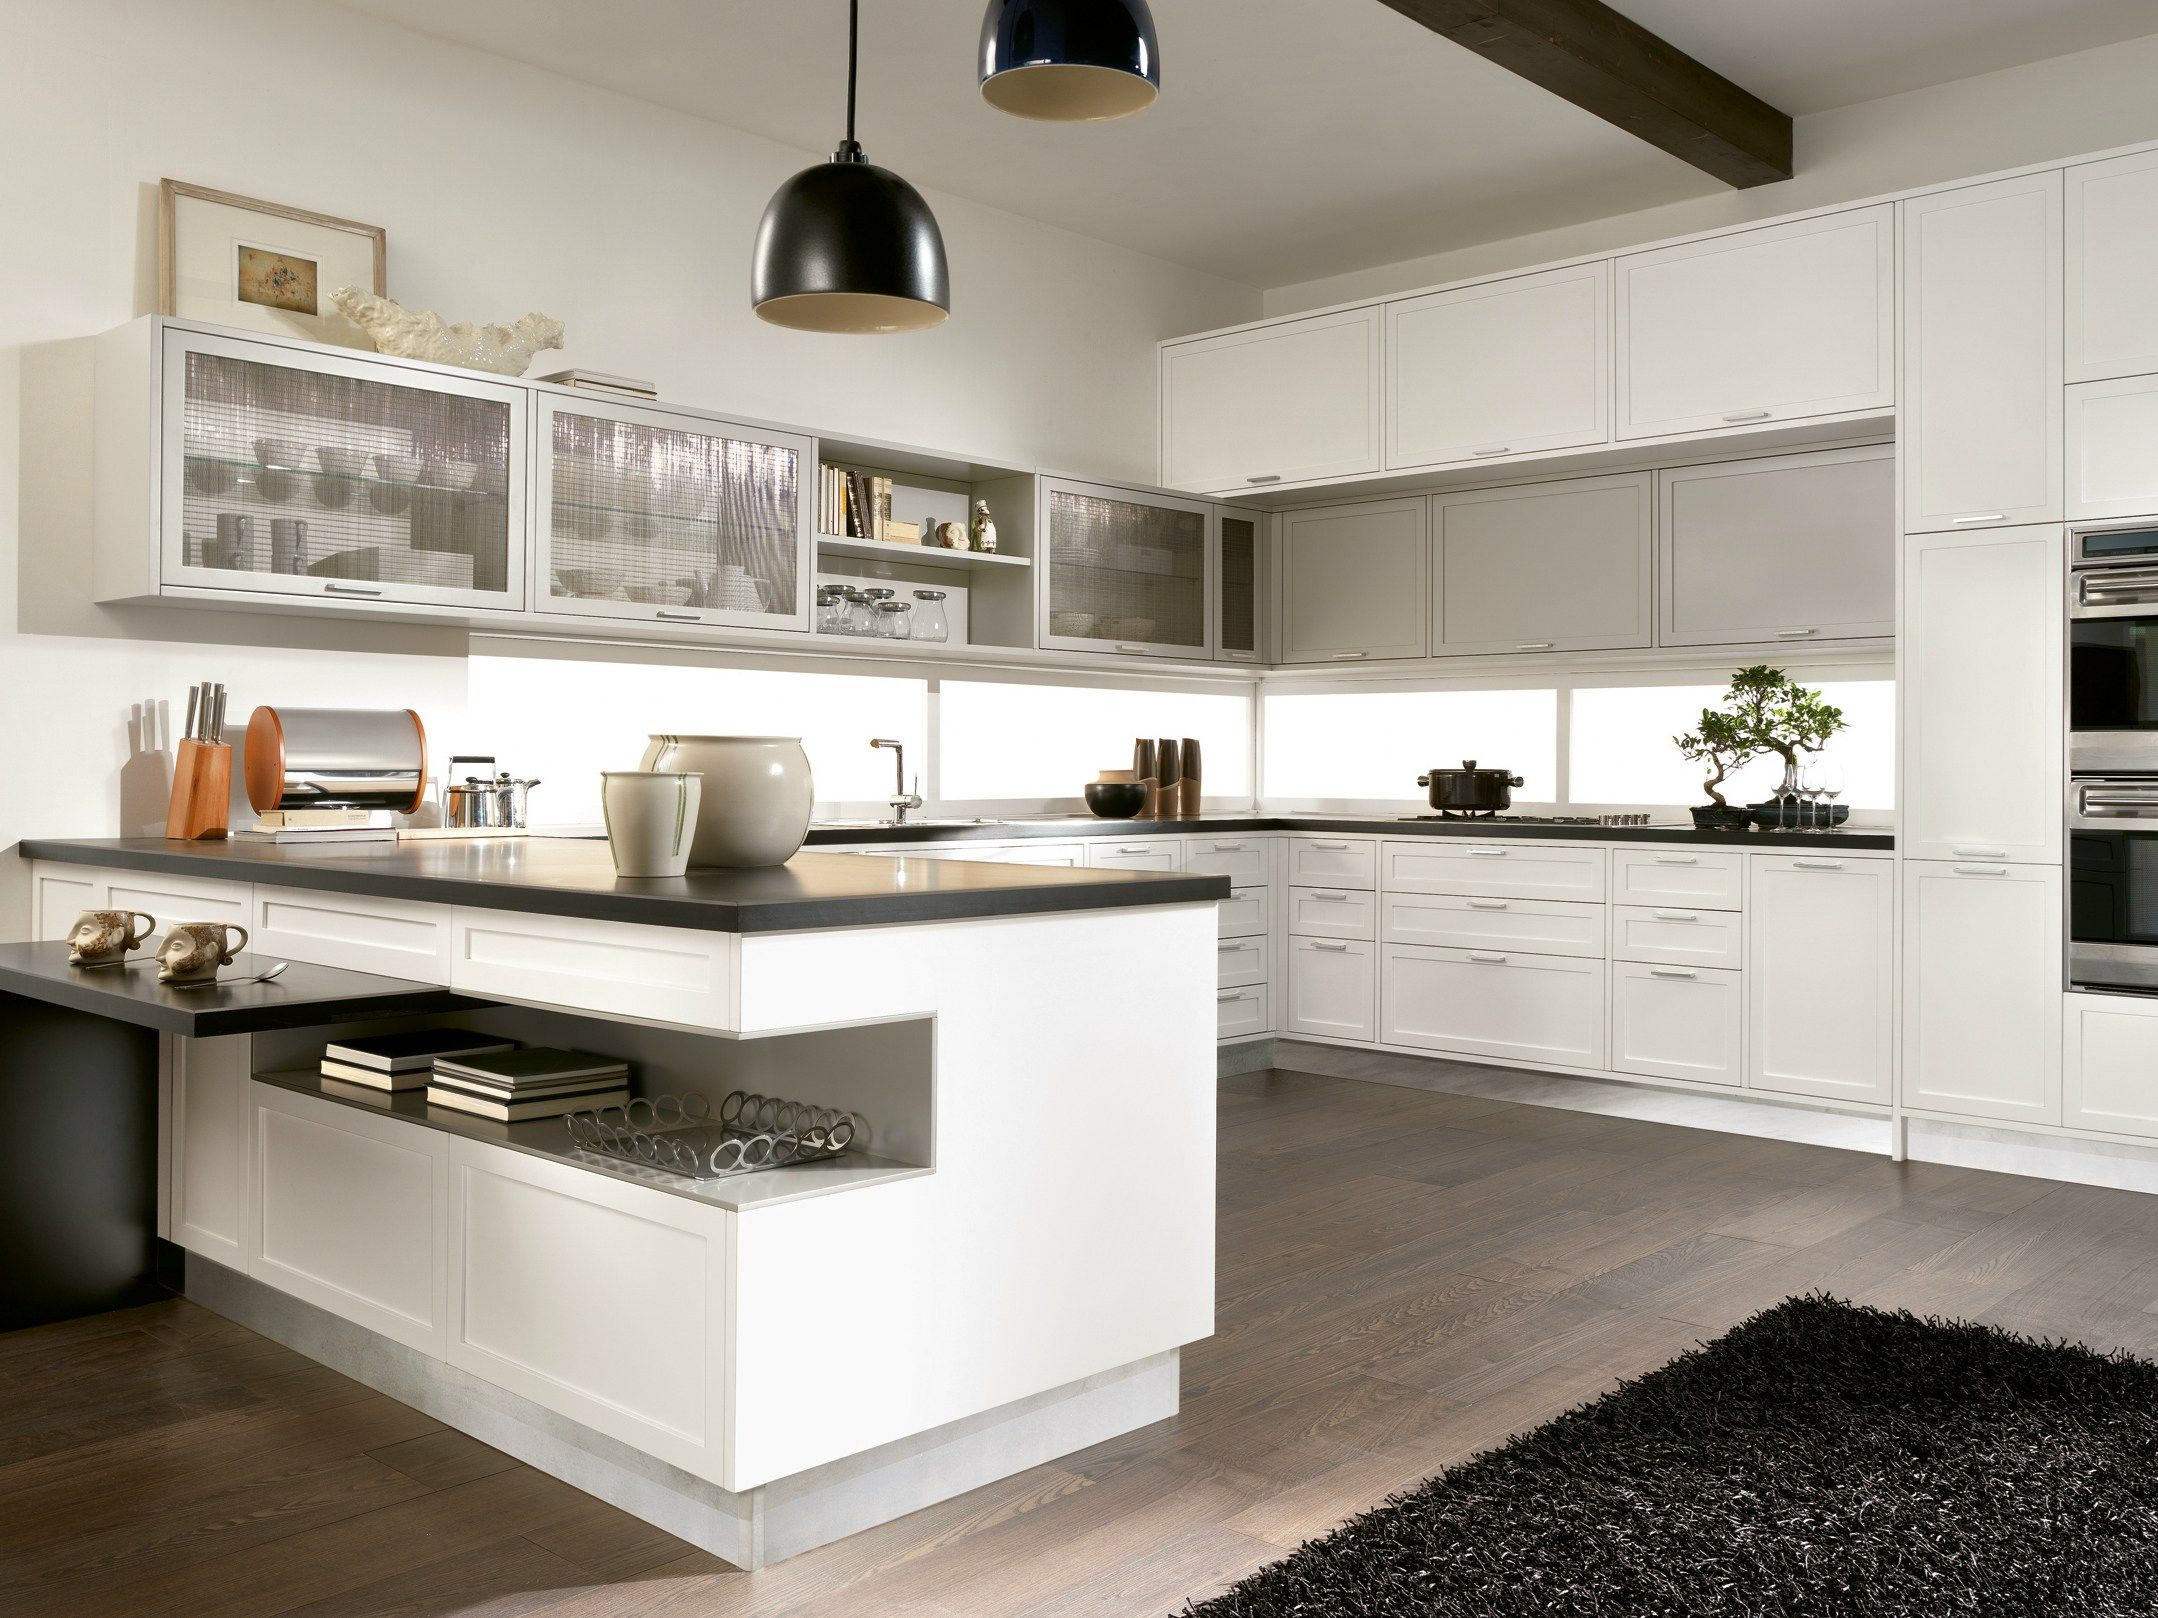 timeline kitchen with peninsula by aster cucine interior de cozinha decoração cozinha cozinha on kitchen remodel timeline id=86397